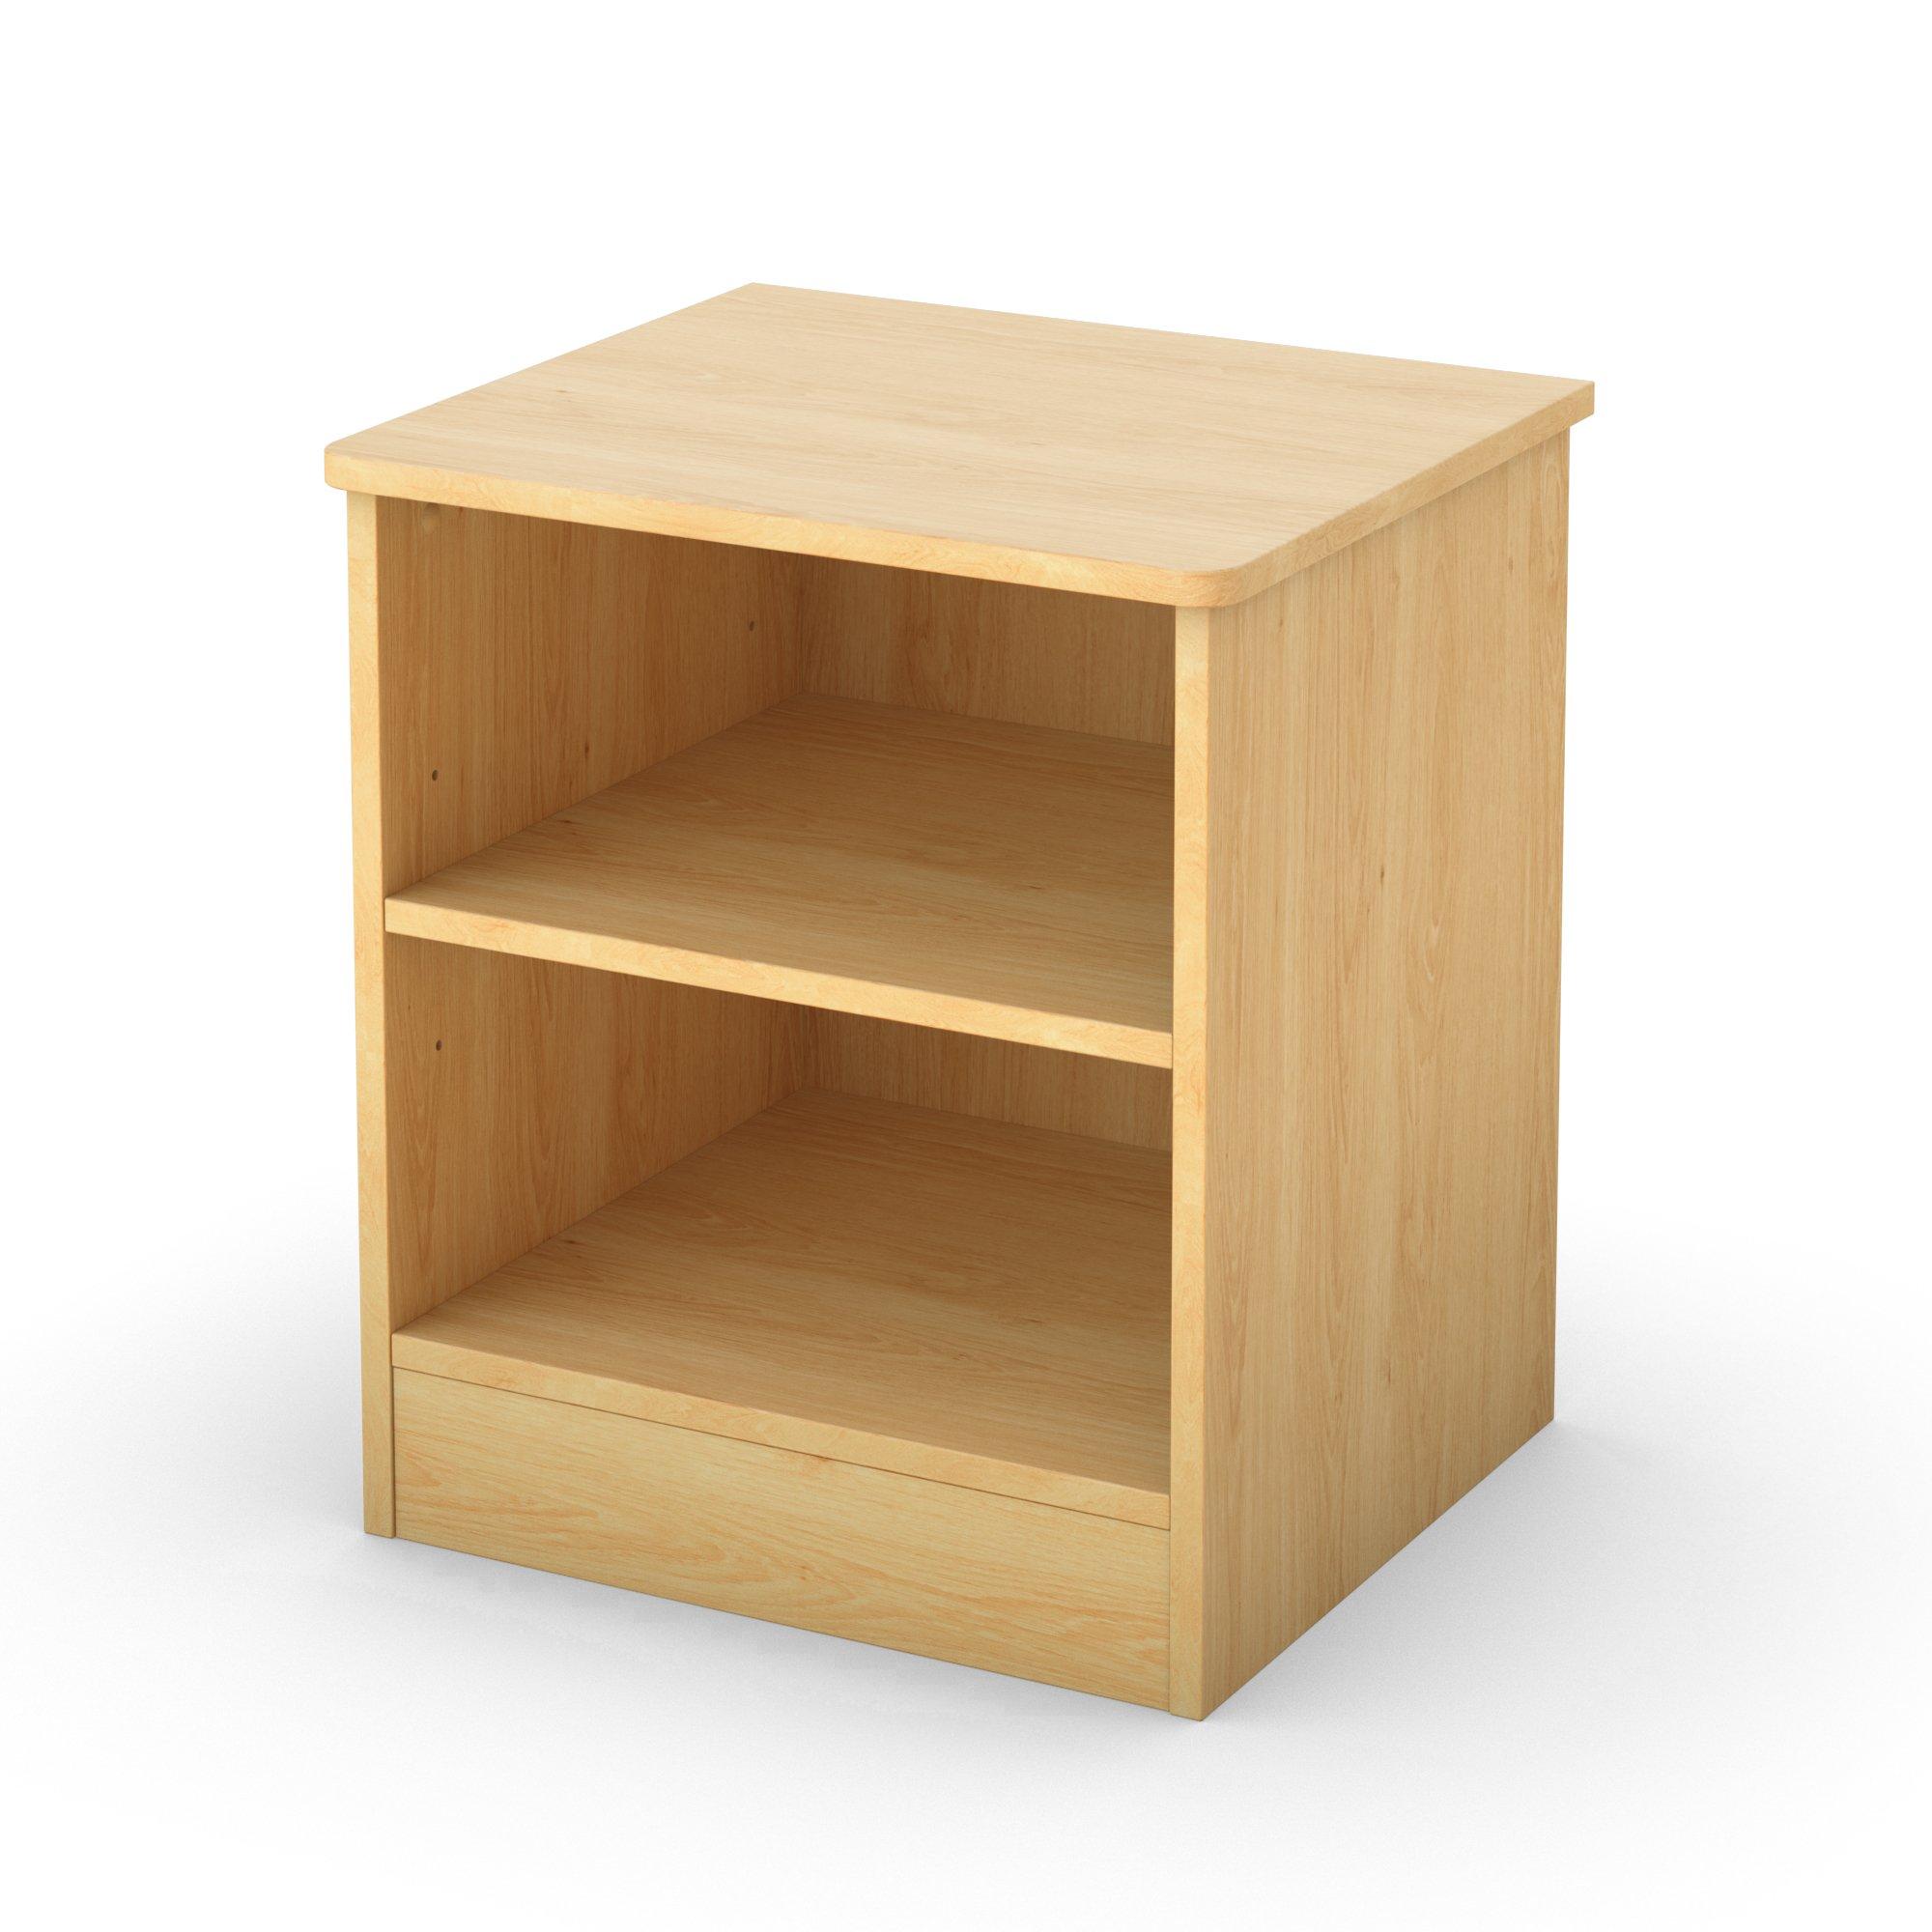 South Shore Libra Open 2-Shelf Nightstand, Natural Maple